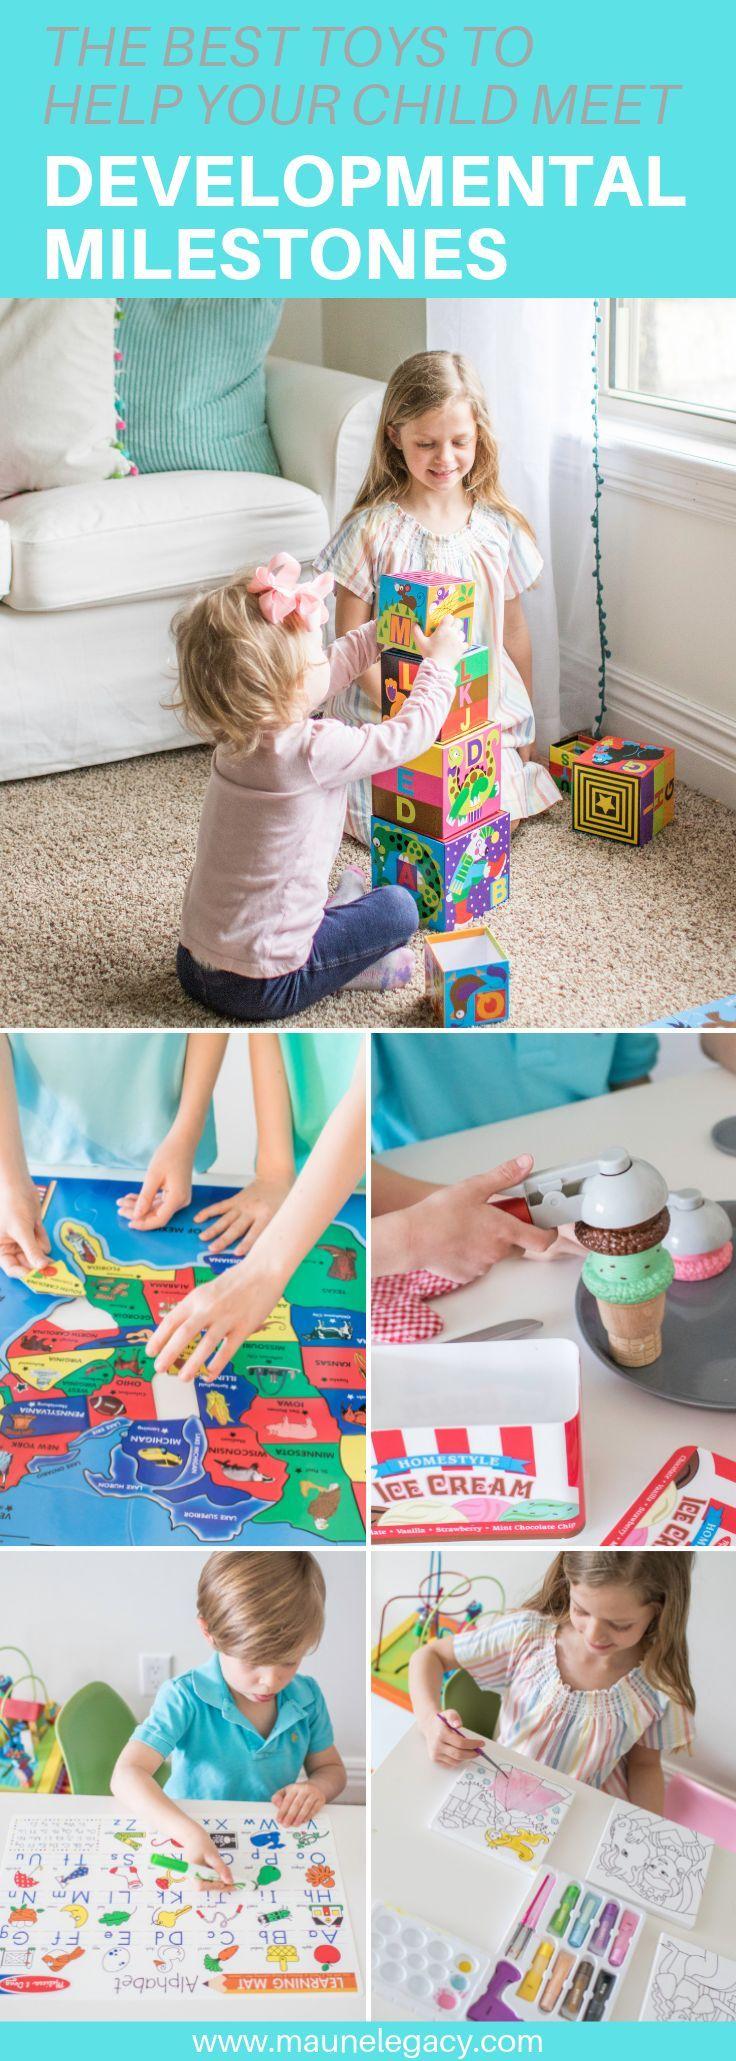 Best Toys To Help Your Child Reach Developmental Milestones | Maune Legacy